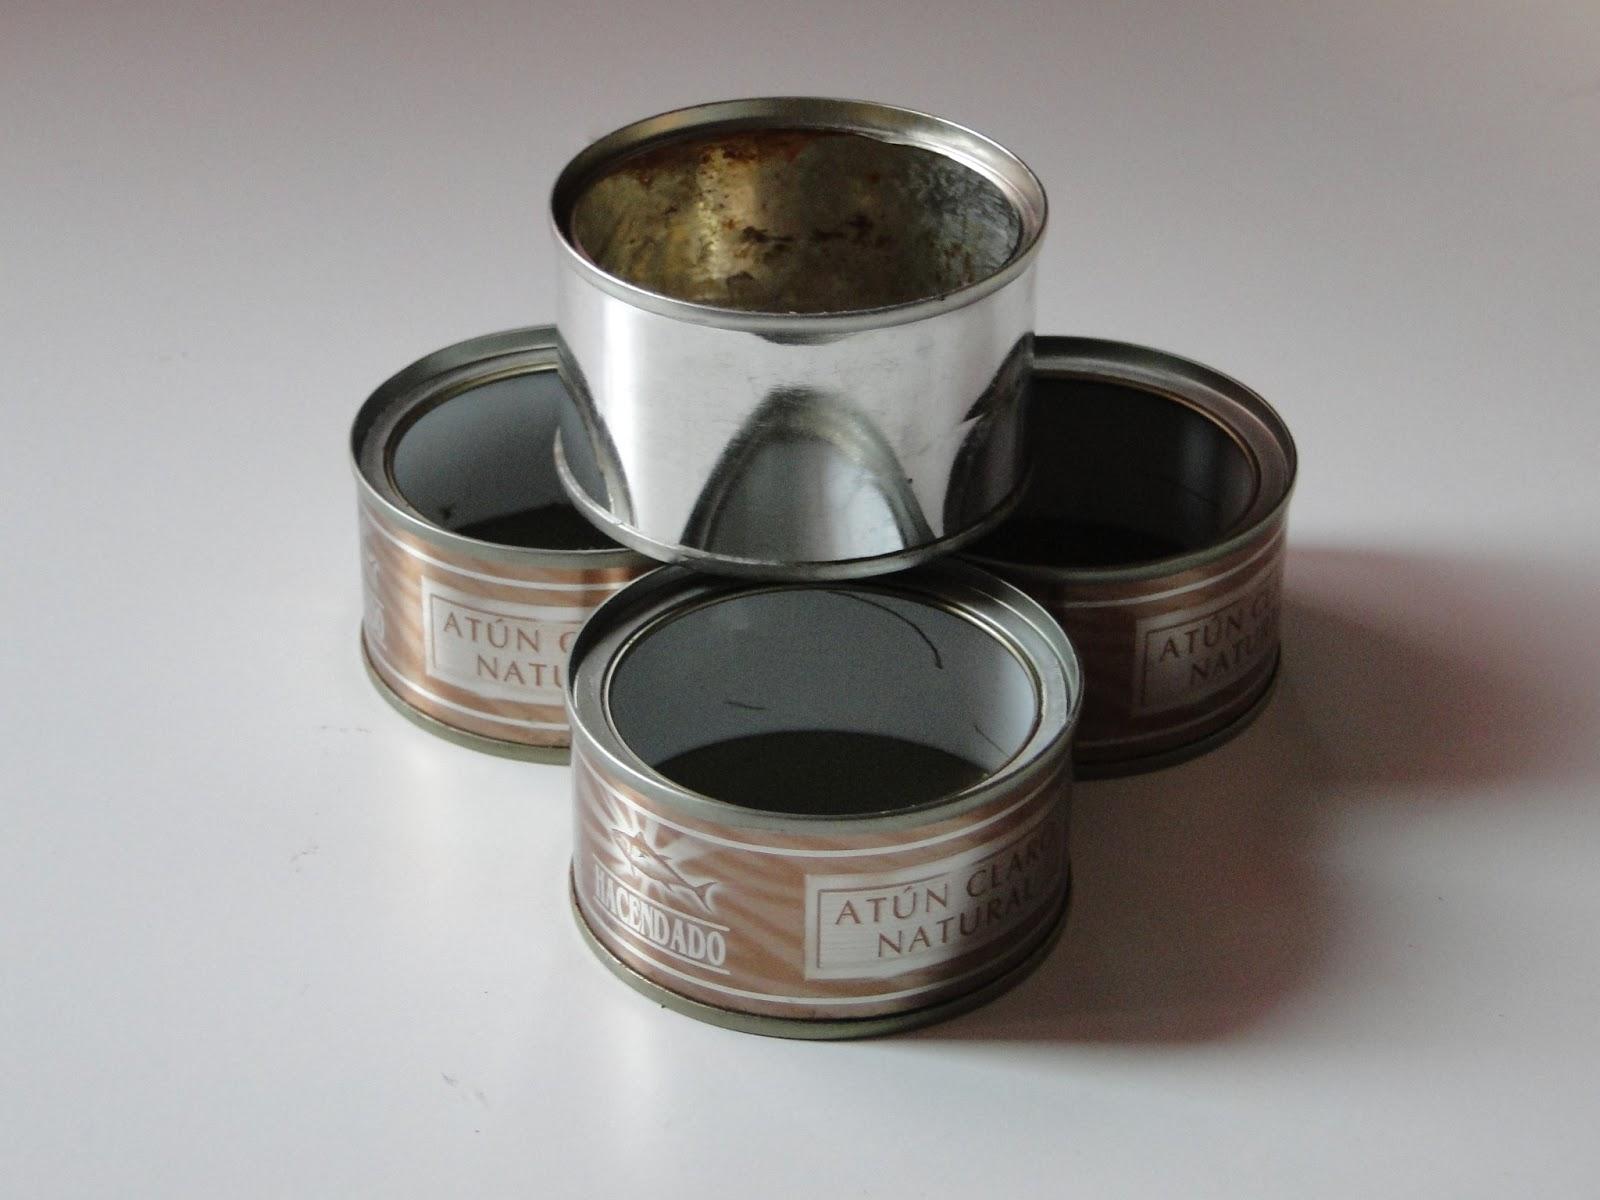 Chicasdiy reciclar latas de conservas - Reciclar latas de conserva ...